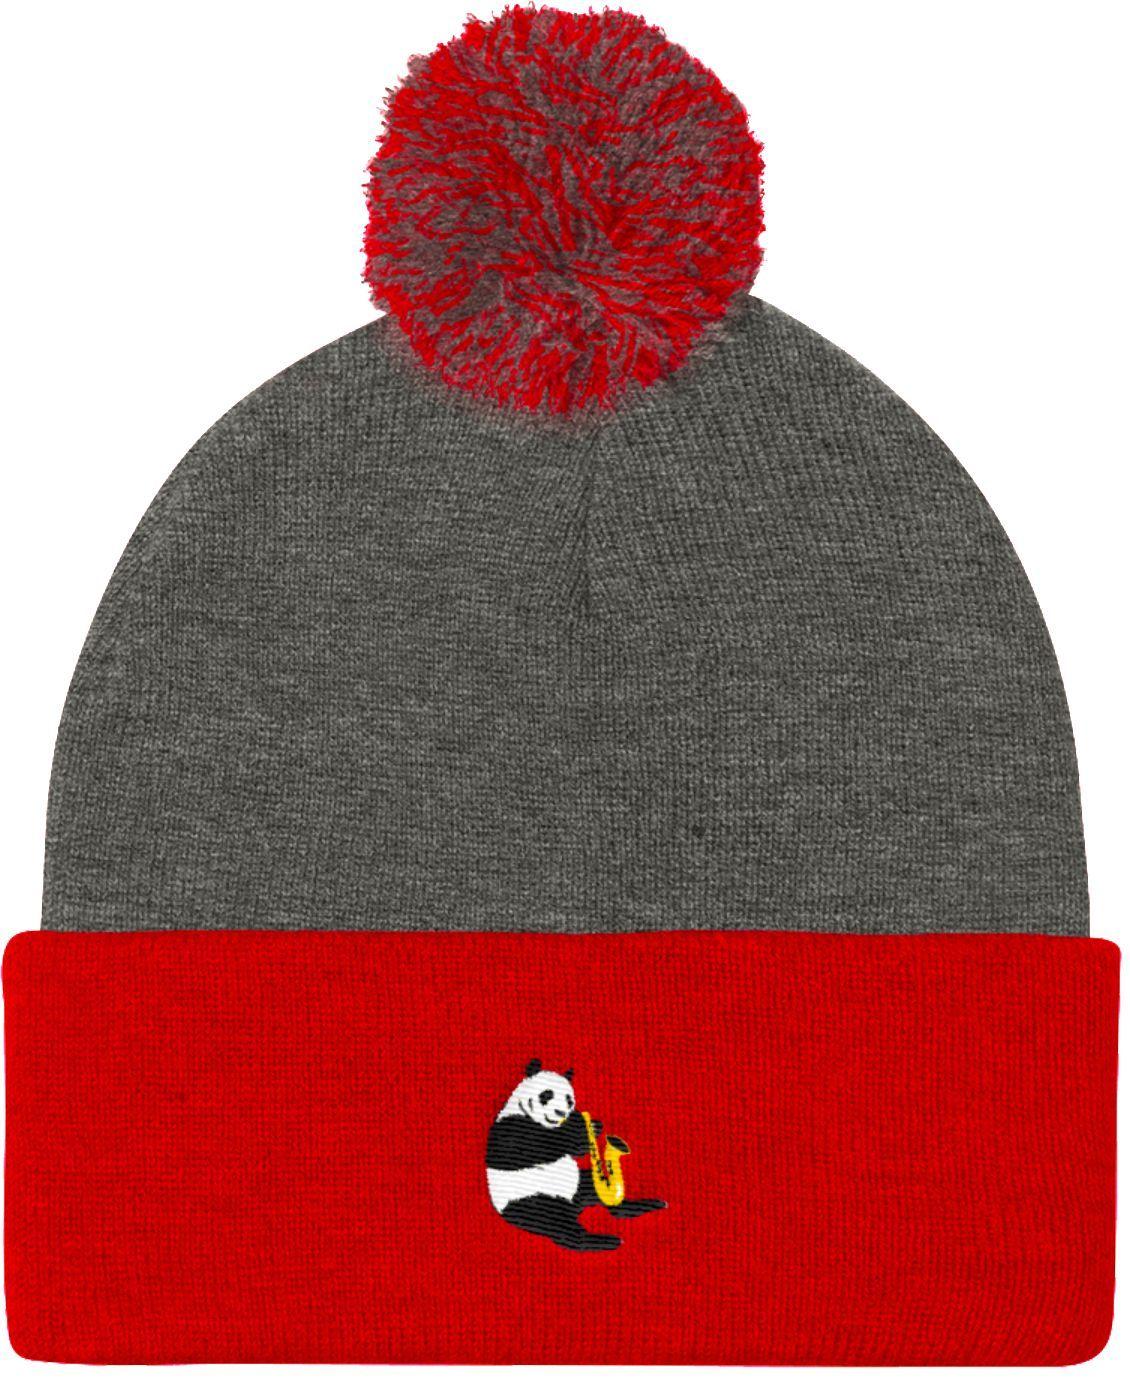 Funny Beanie Hats e011d3451ca